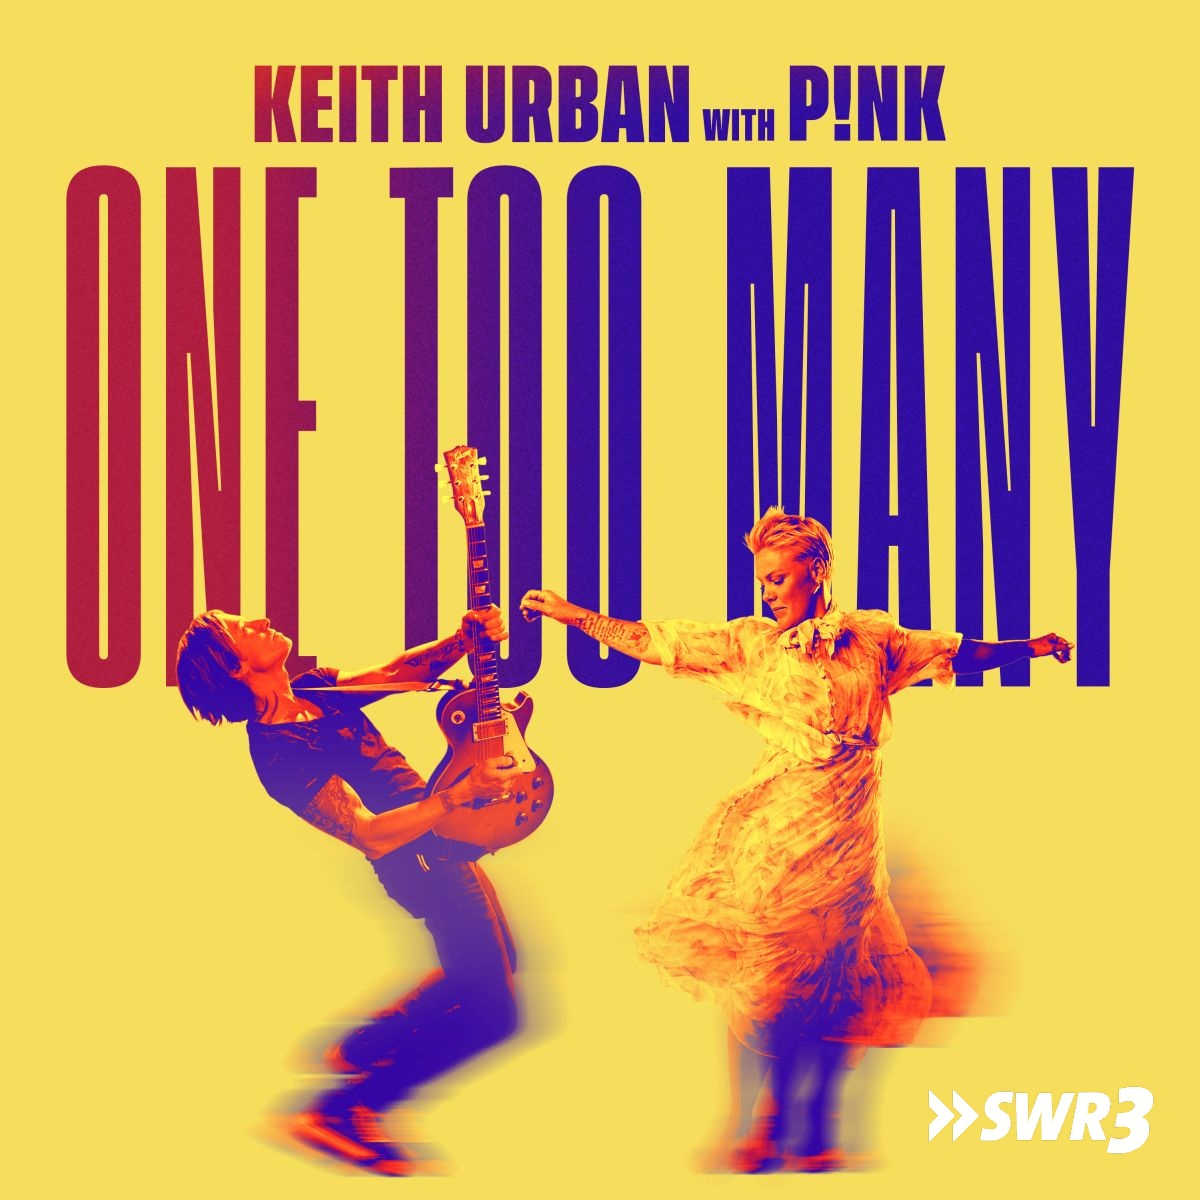 One too many (Foto: Keith Urban)